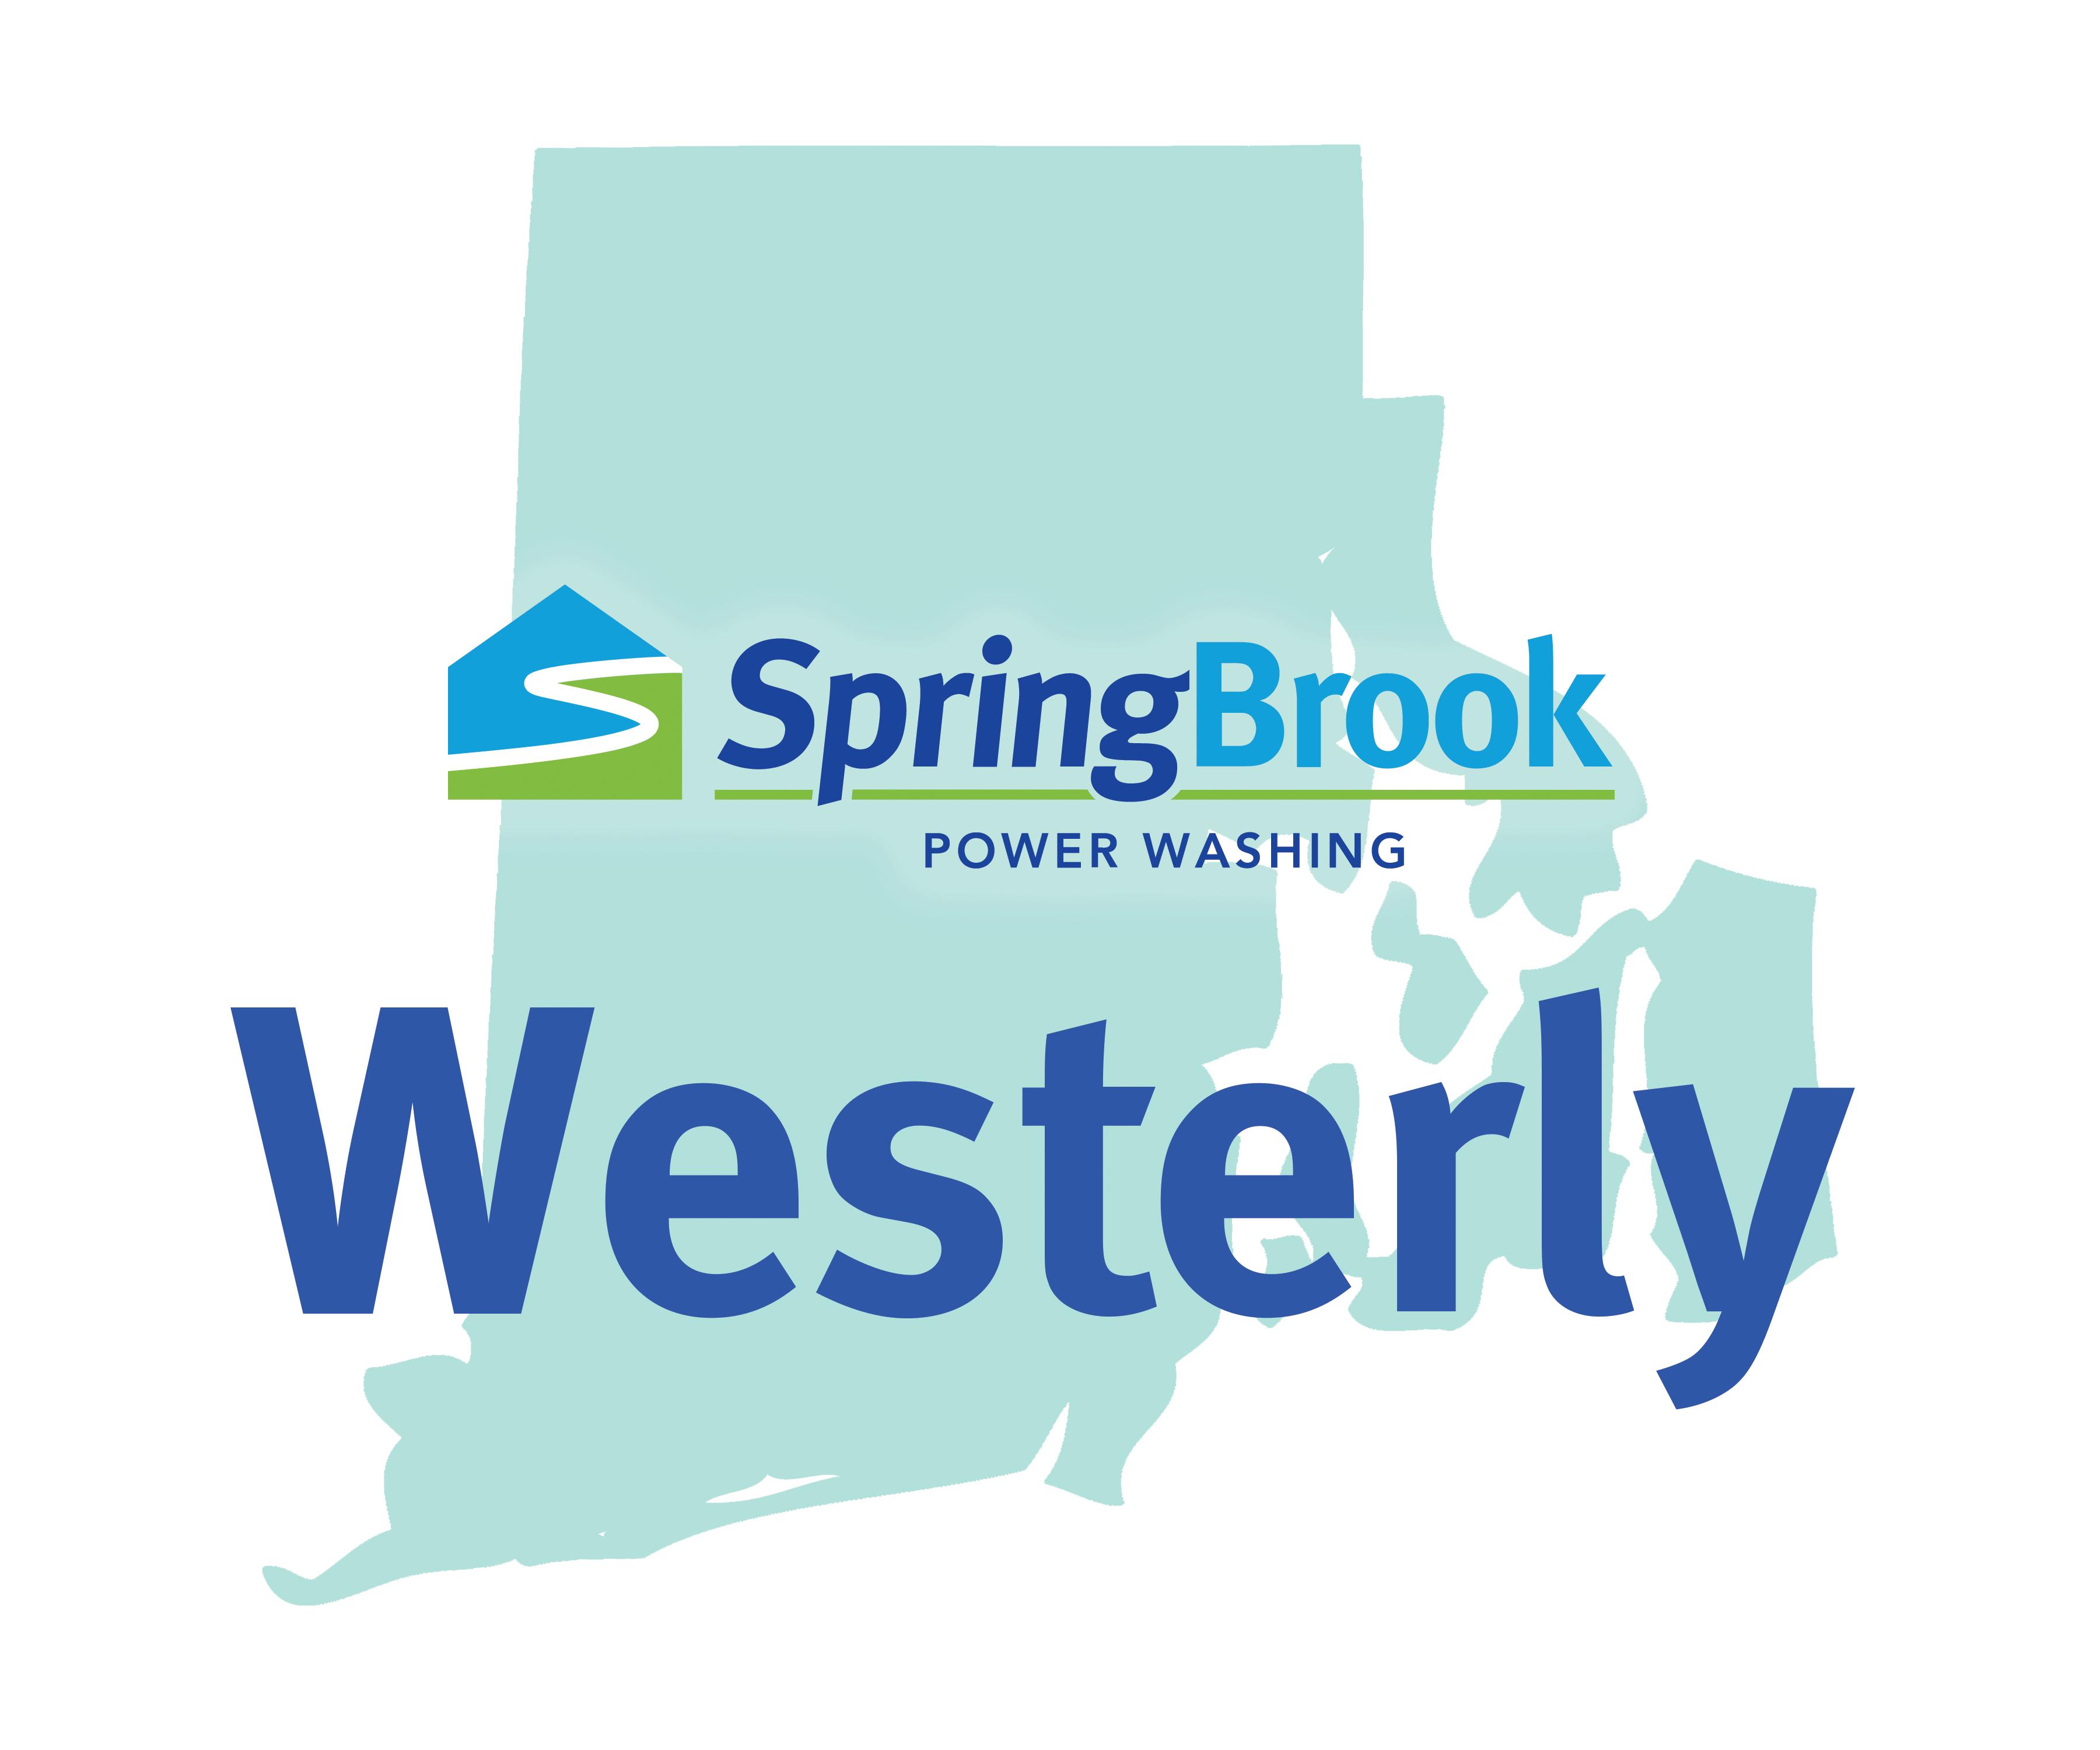 Springbrook Power Washing Westerly Rhode Island